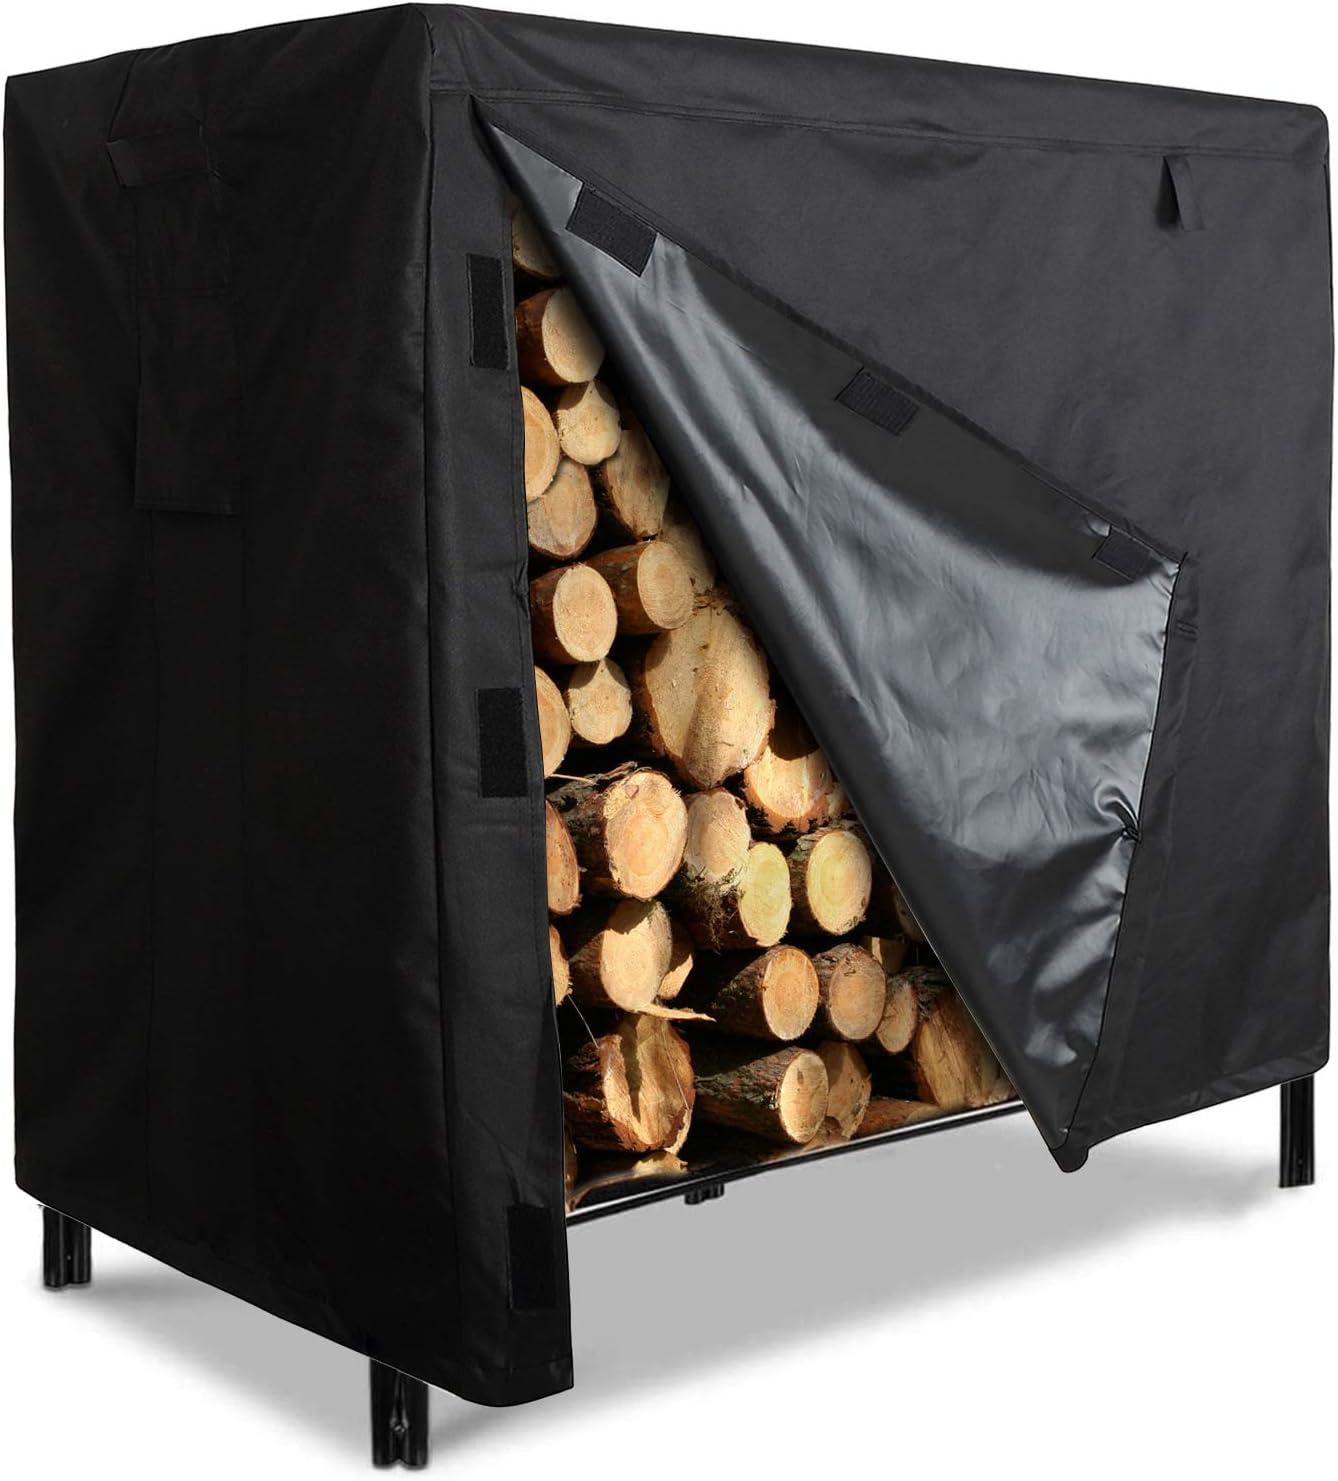 Suwimut New sales Firewood Rack Cover 4 High quality new Oxford 600D Feet Waterproof Heavy